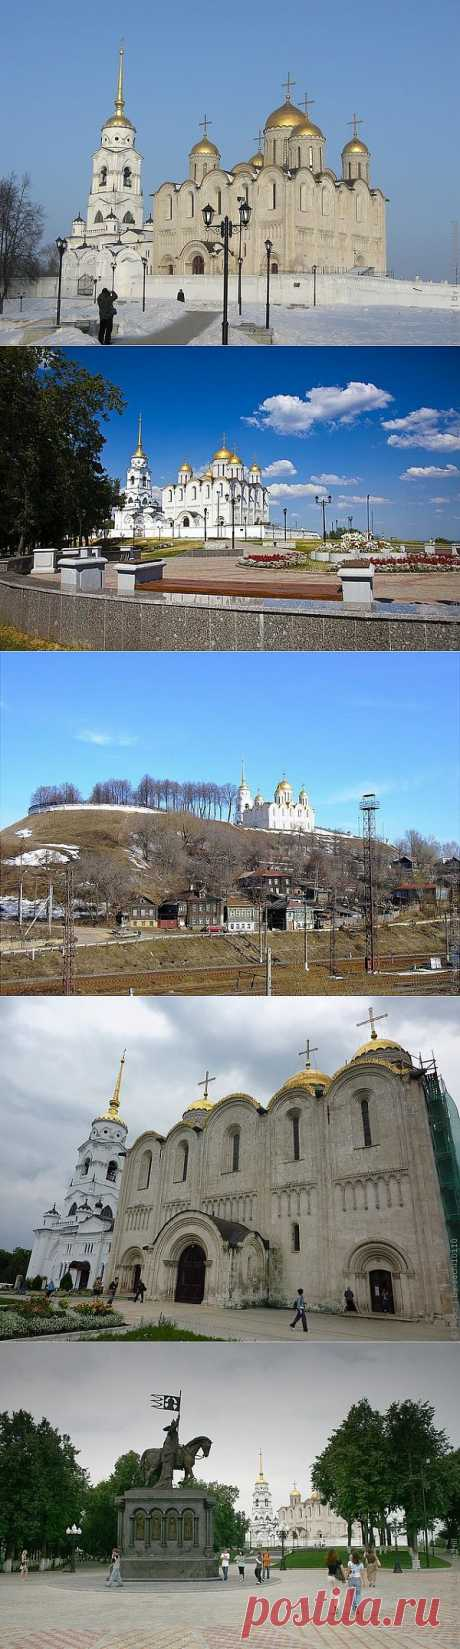 Успенский собор во Владимире, фото и описание собора